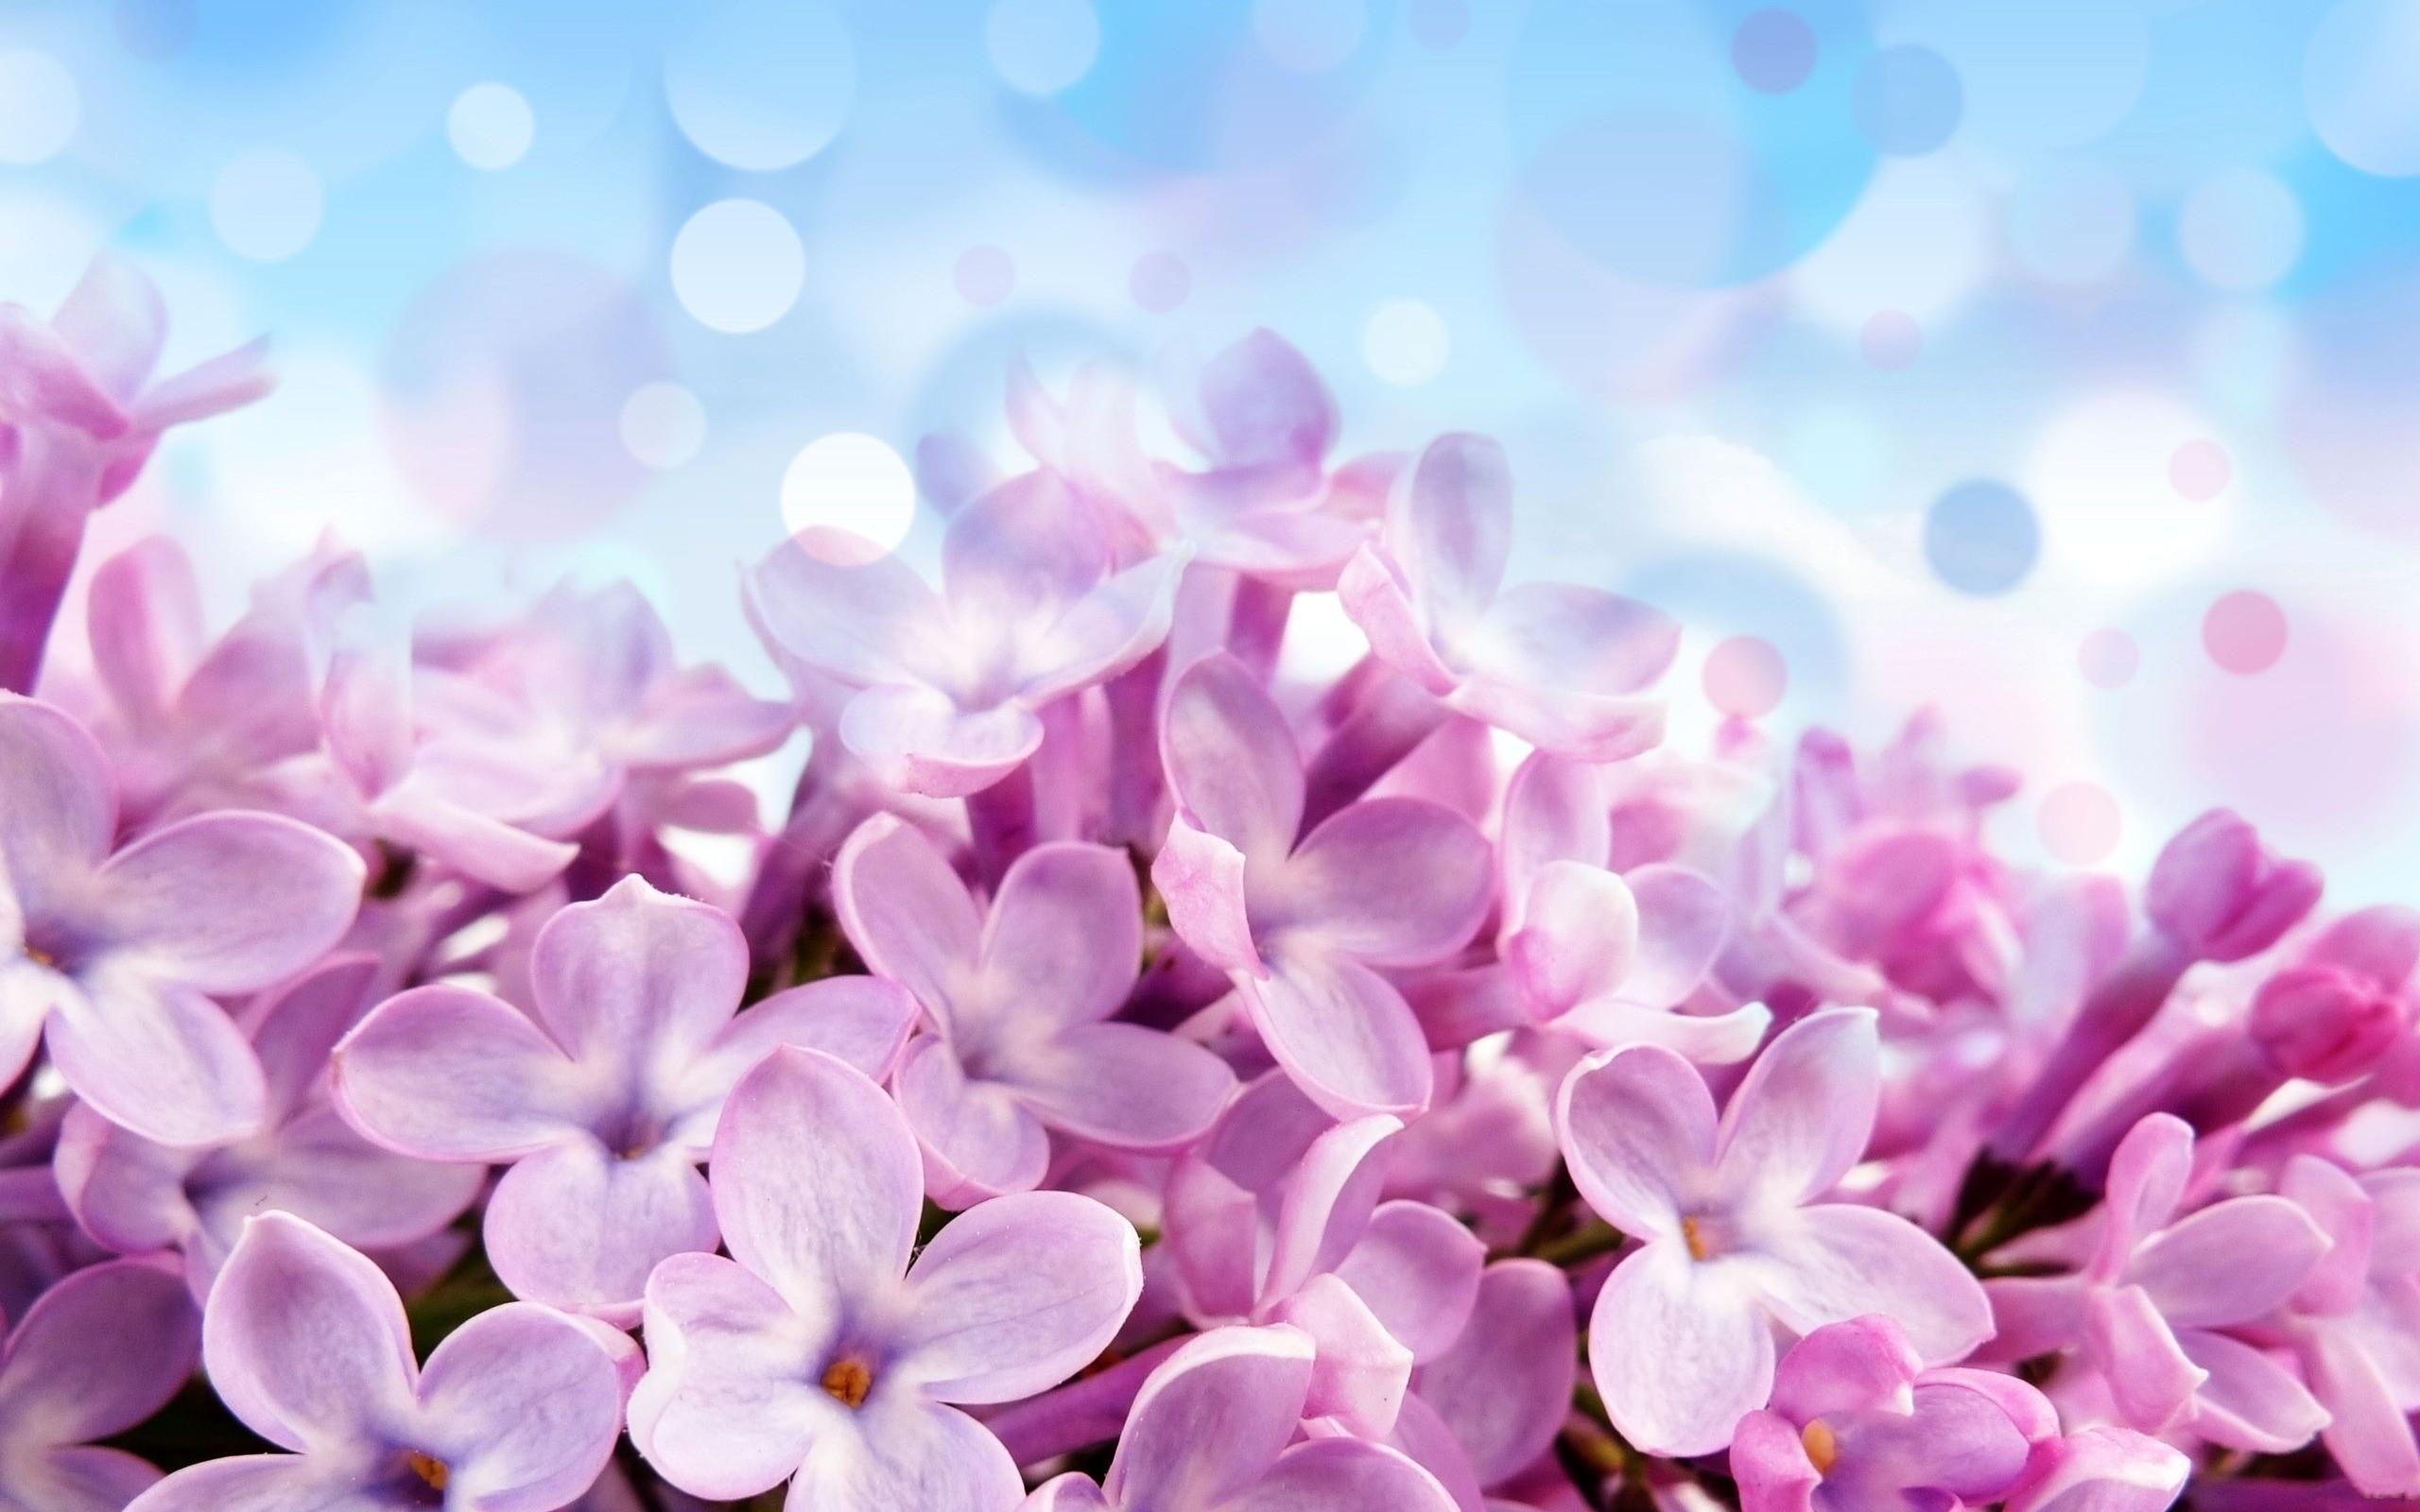 Wall Paper Wide Pink Rose Colours Soft Nature Flower: デスクトップ壁紙 : ピンクの花, 紫の, ライラック, 工場, フローラ, 花弁, 陸上植物, 開花植物, マクロ